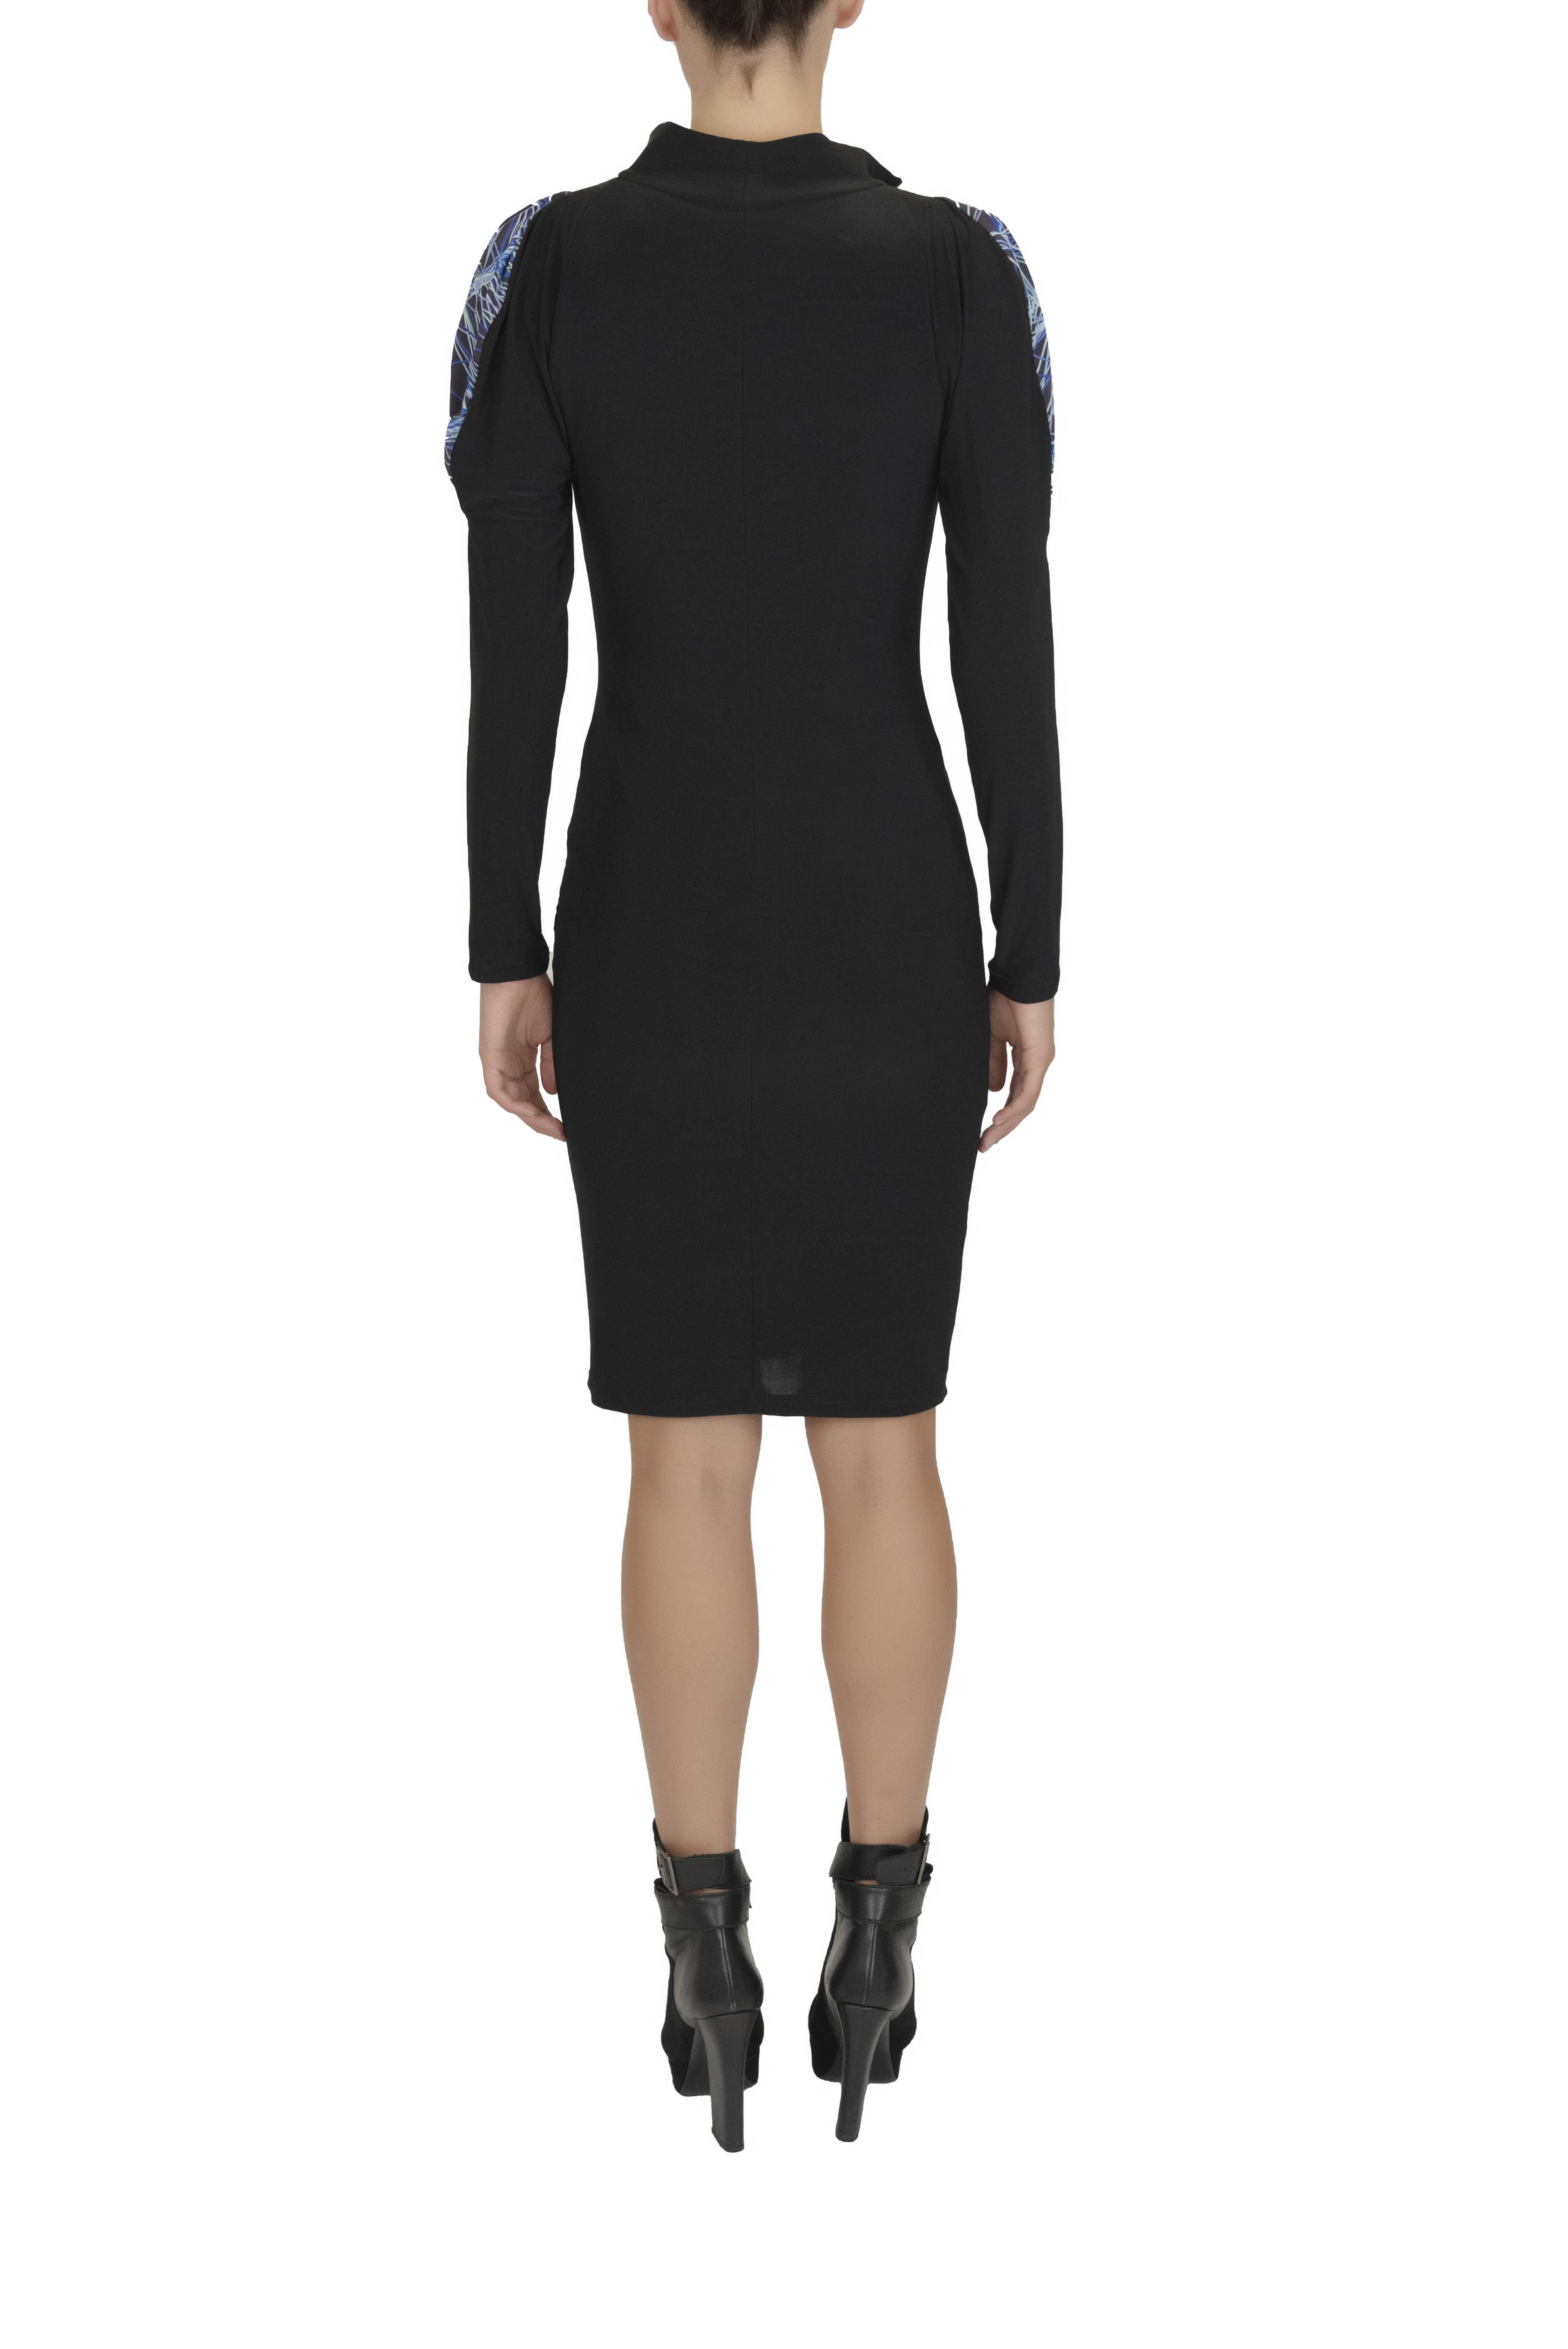 Dress BHARANI 2